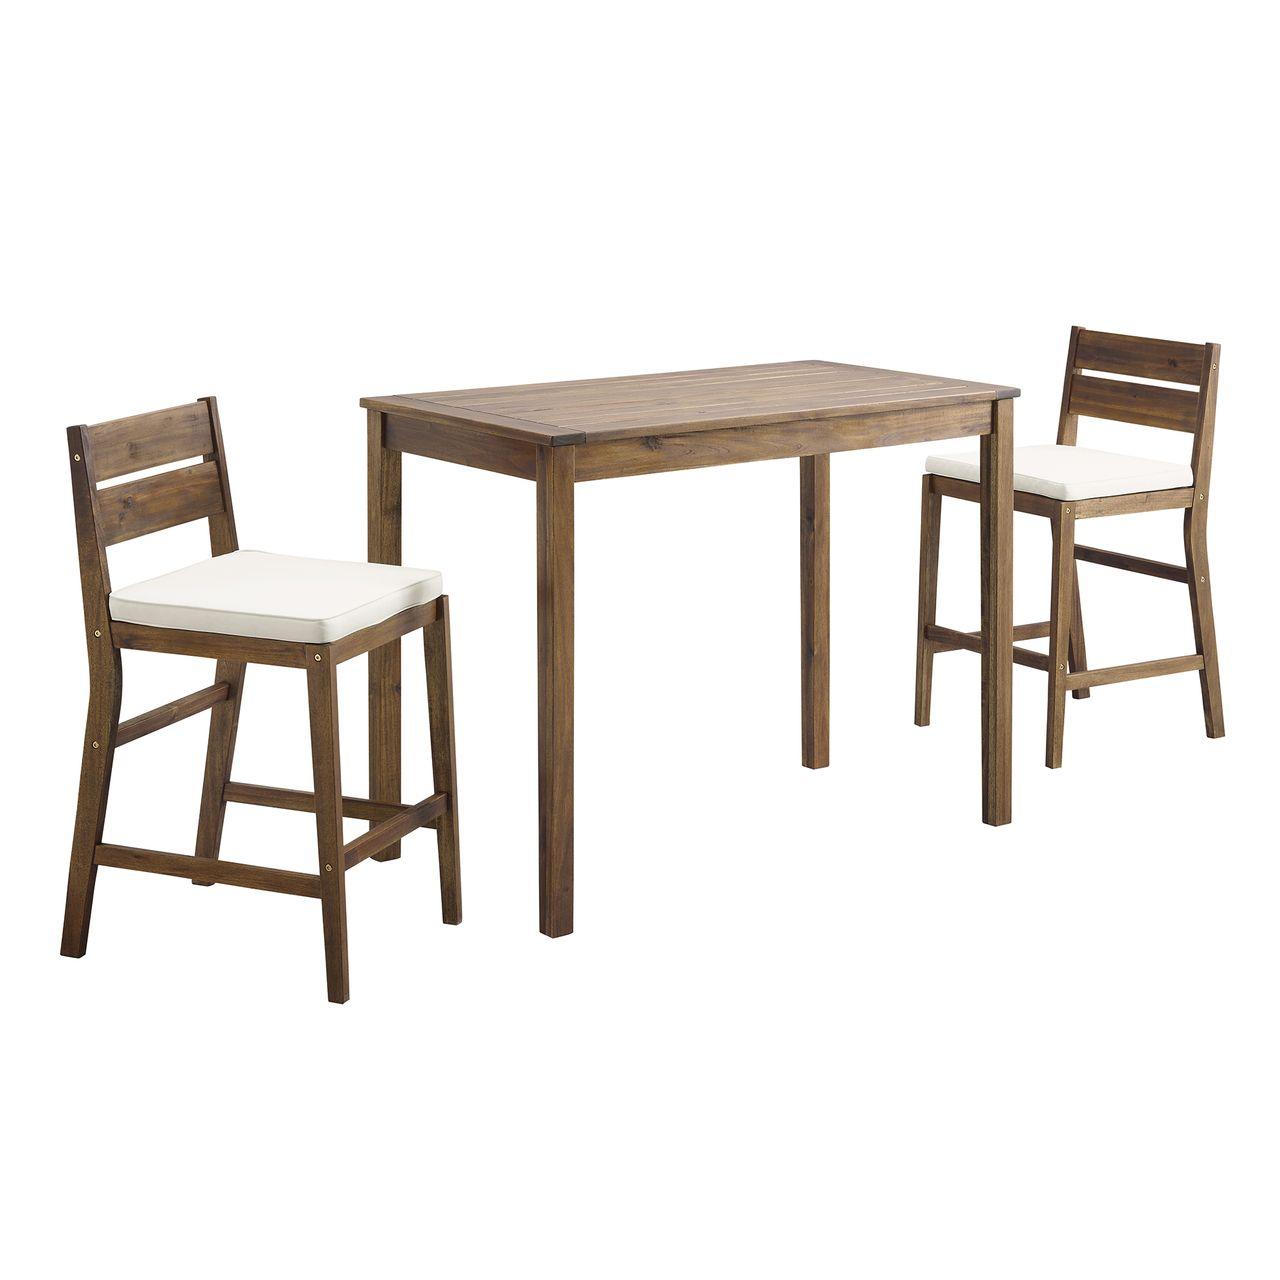 Walker Edison 3-Piece Acacia Counter Height Dining Group - Dark Brown